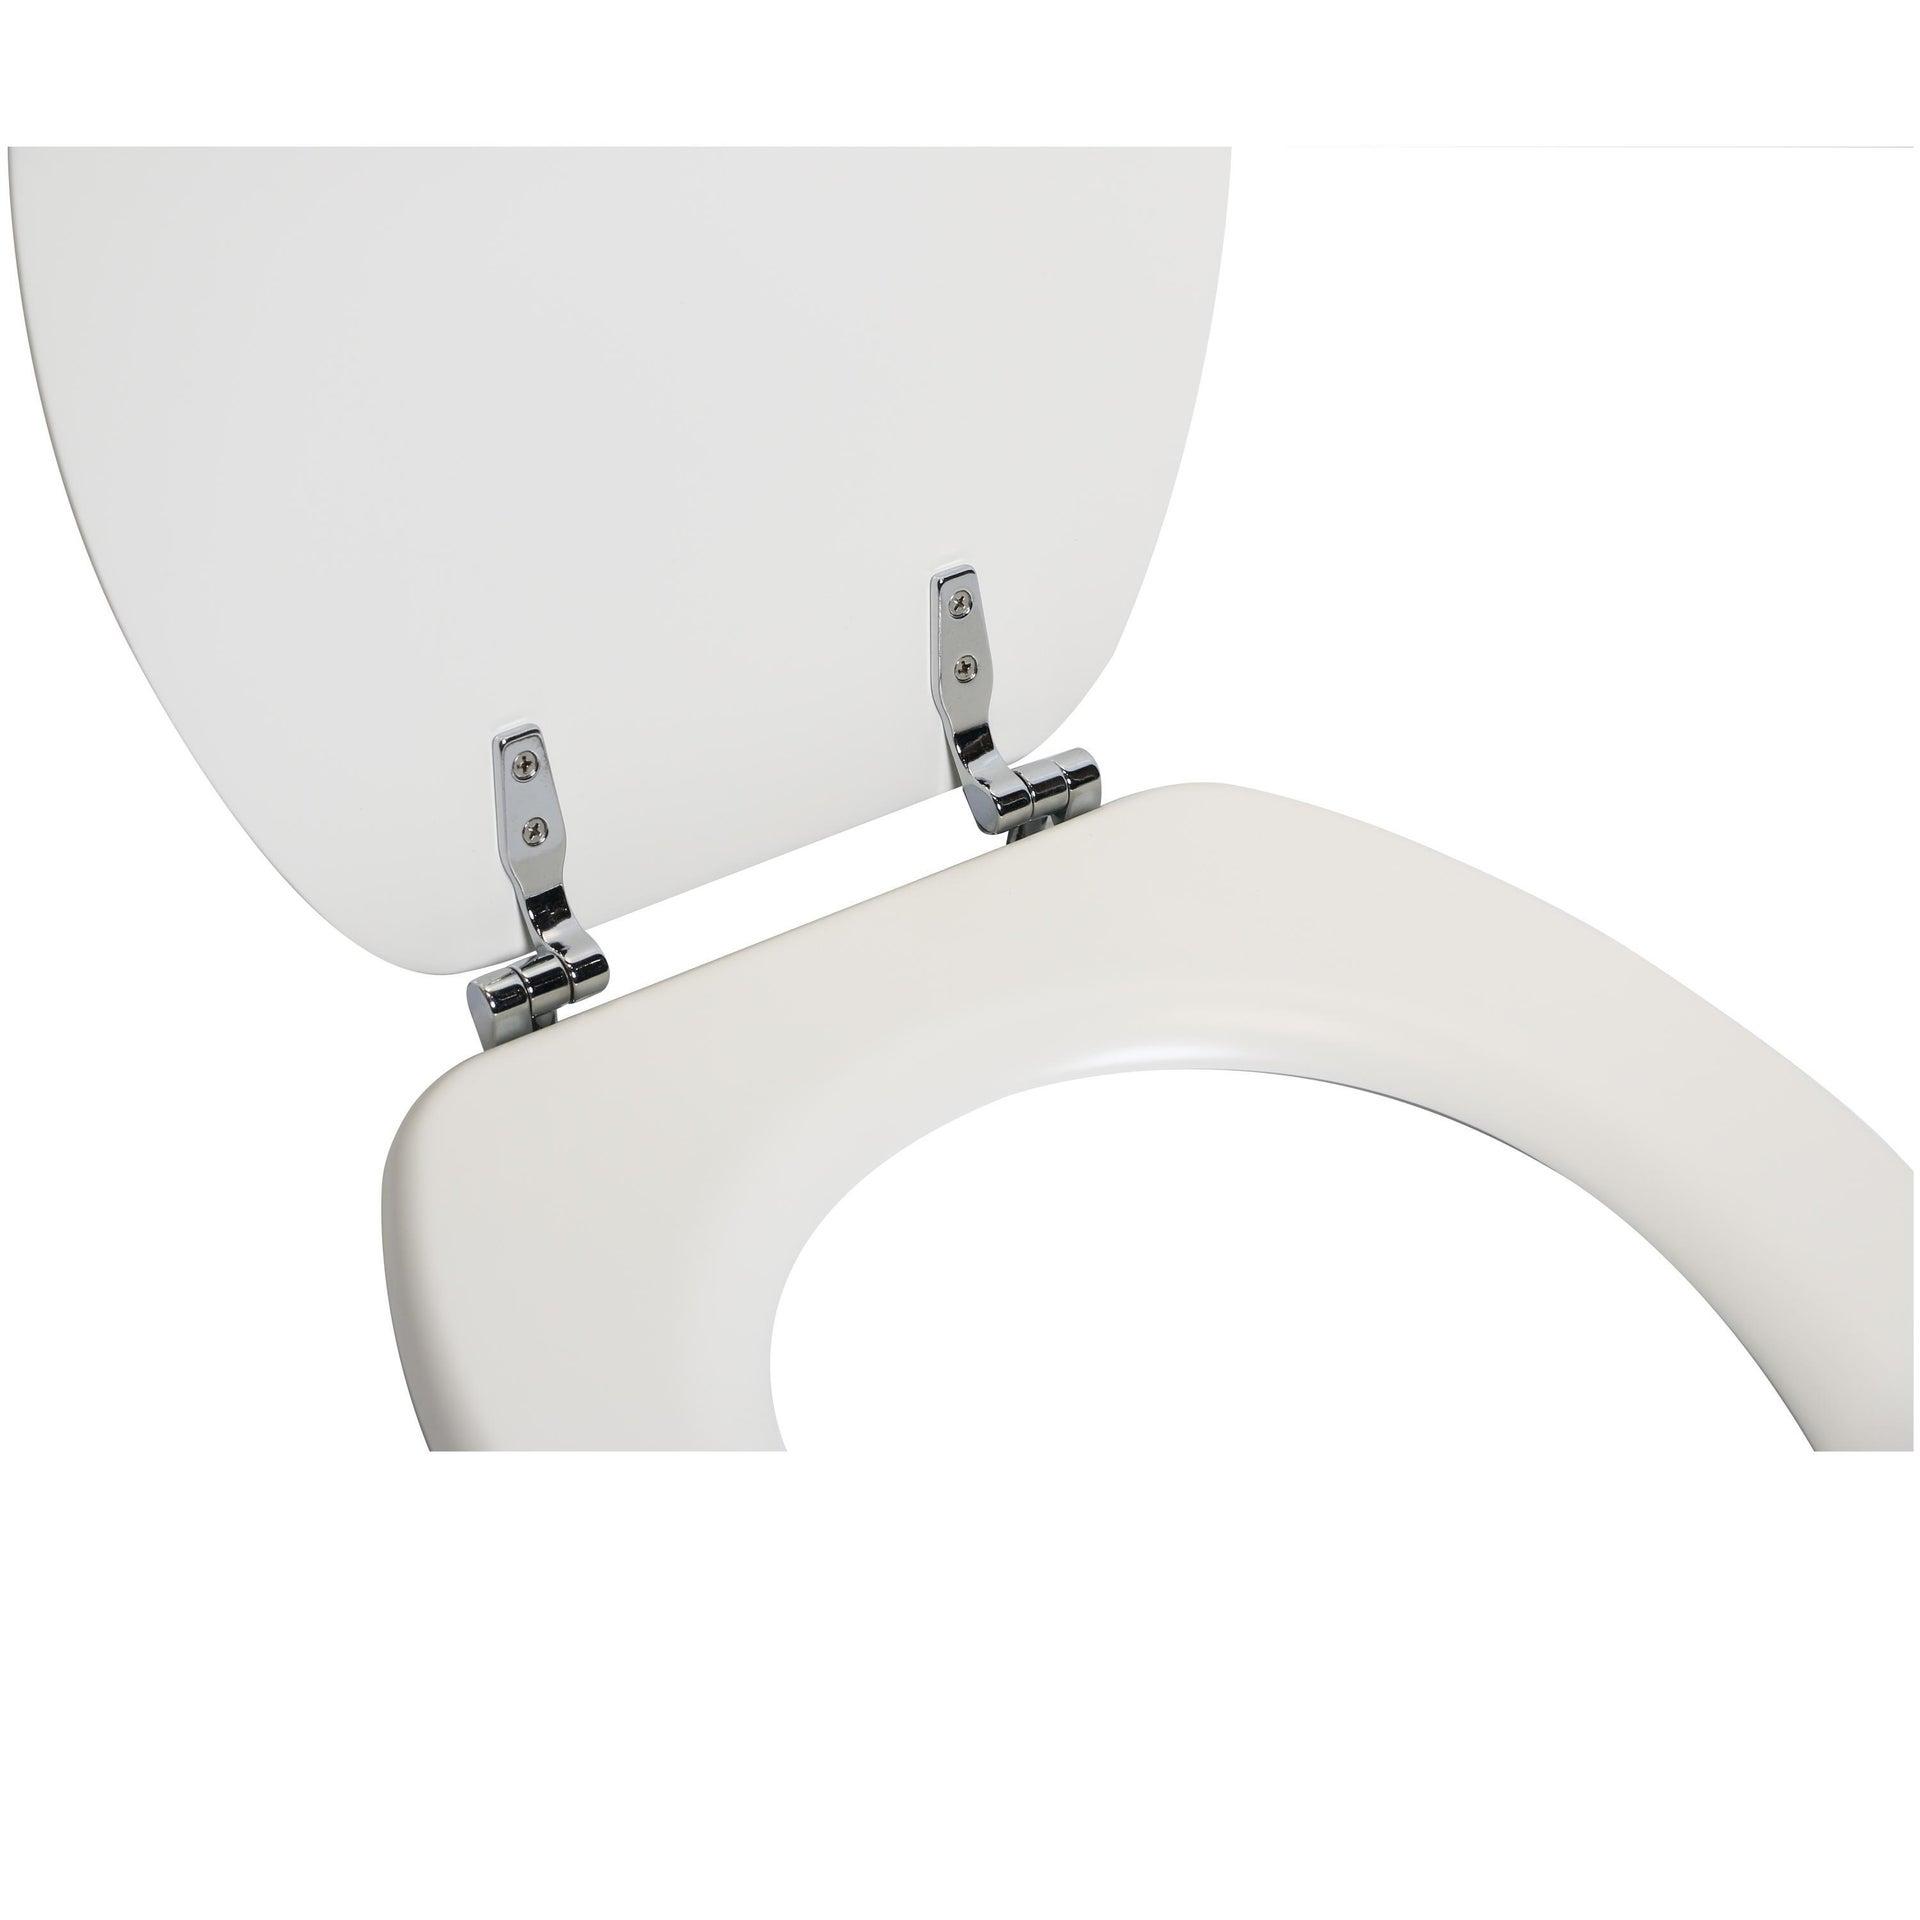 Copriwater ovale Universale Pop SENSEA mdf bianco - 6